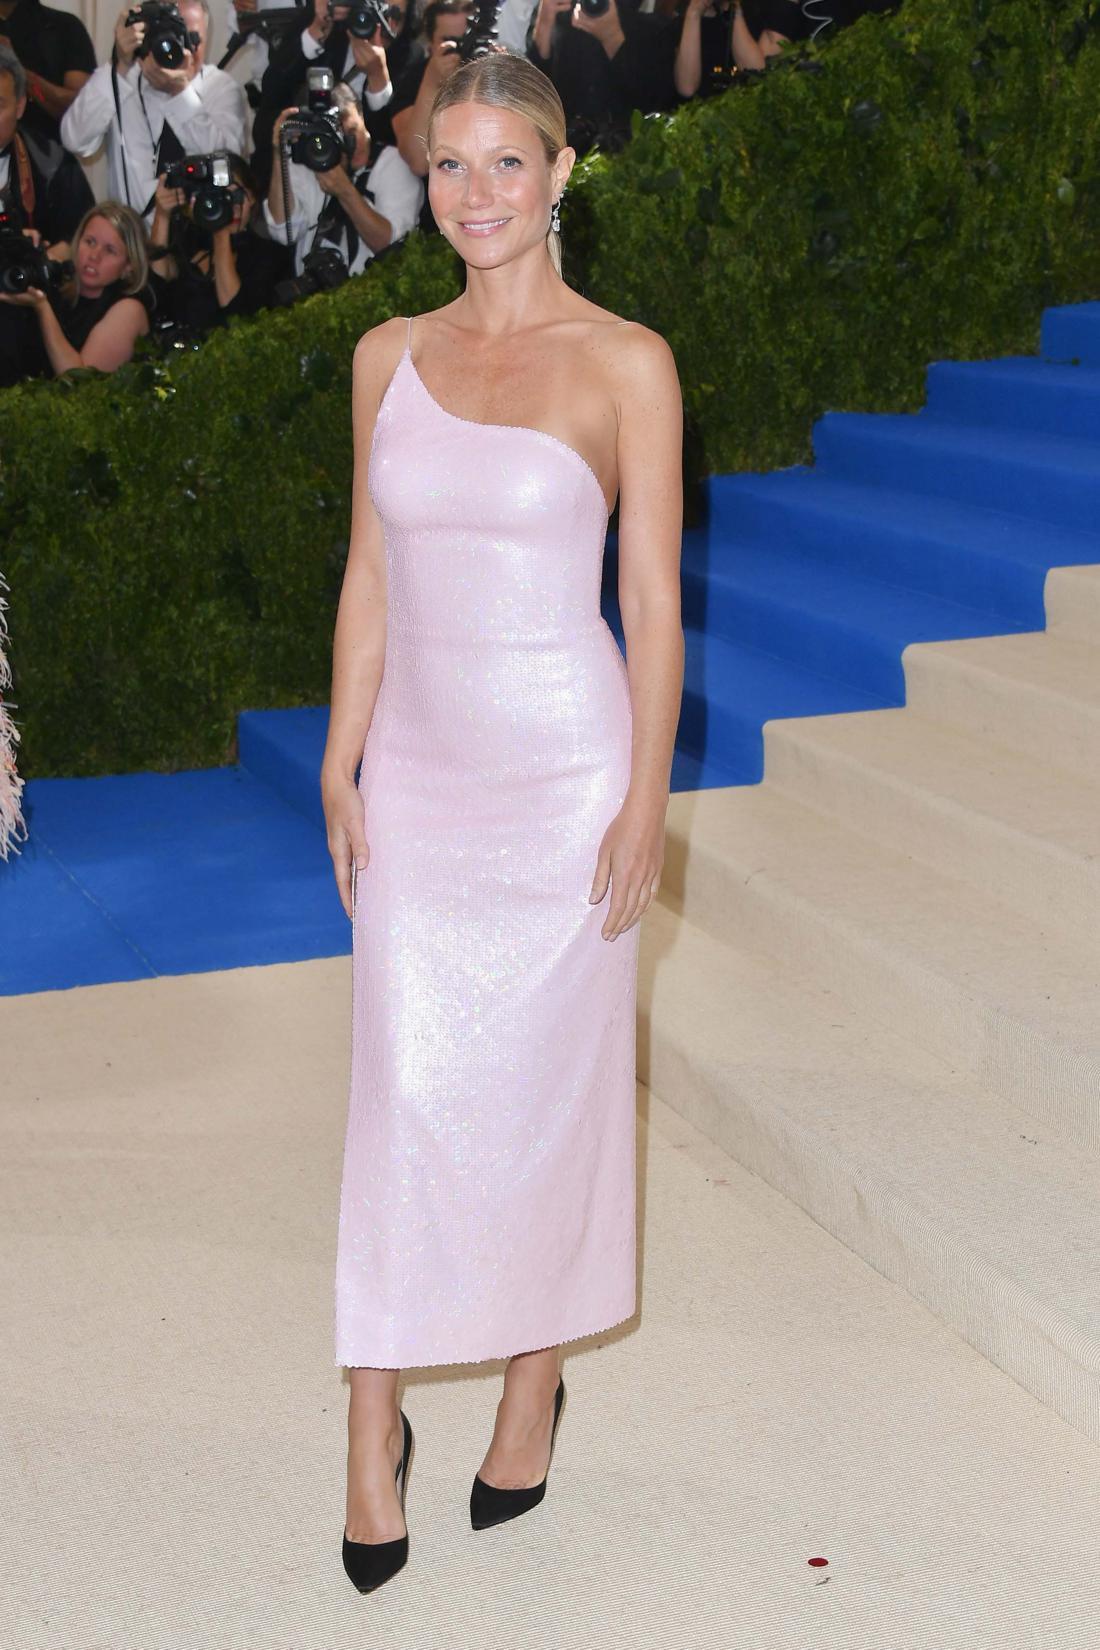 Gwyneth Paltrow in Calvin Klein (Photo by George Pimentel/WireImage)